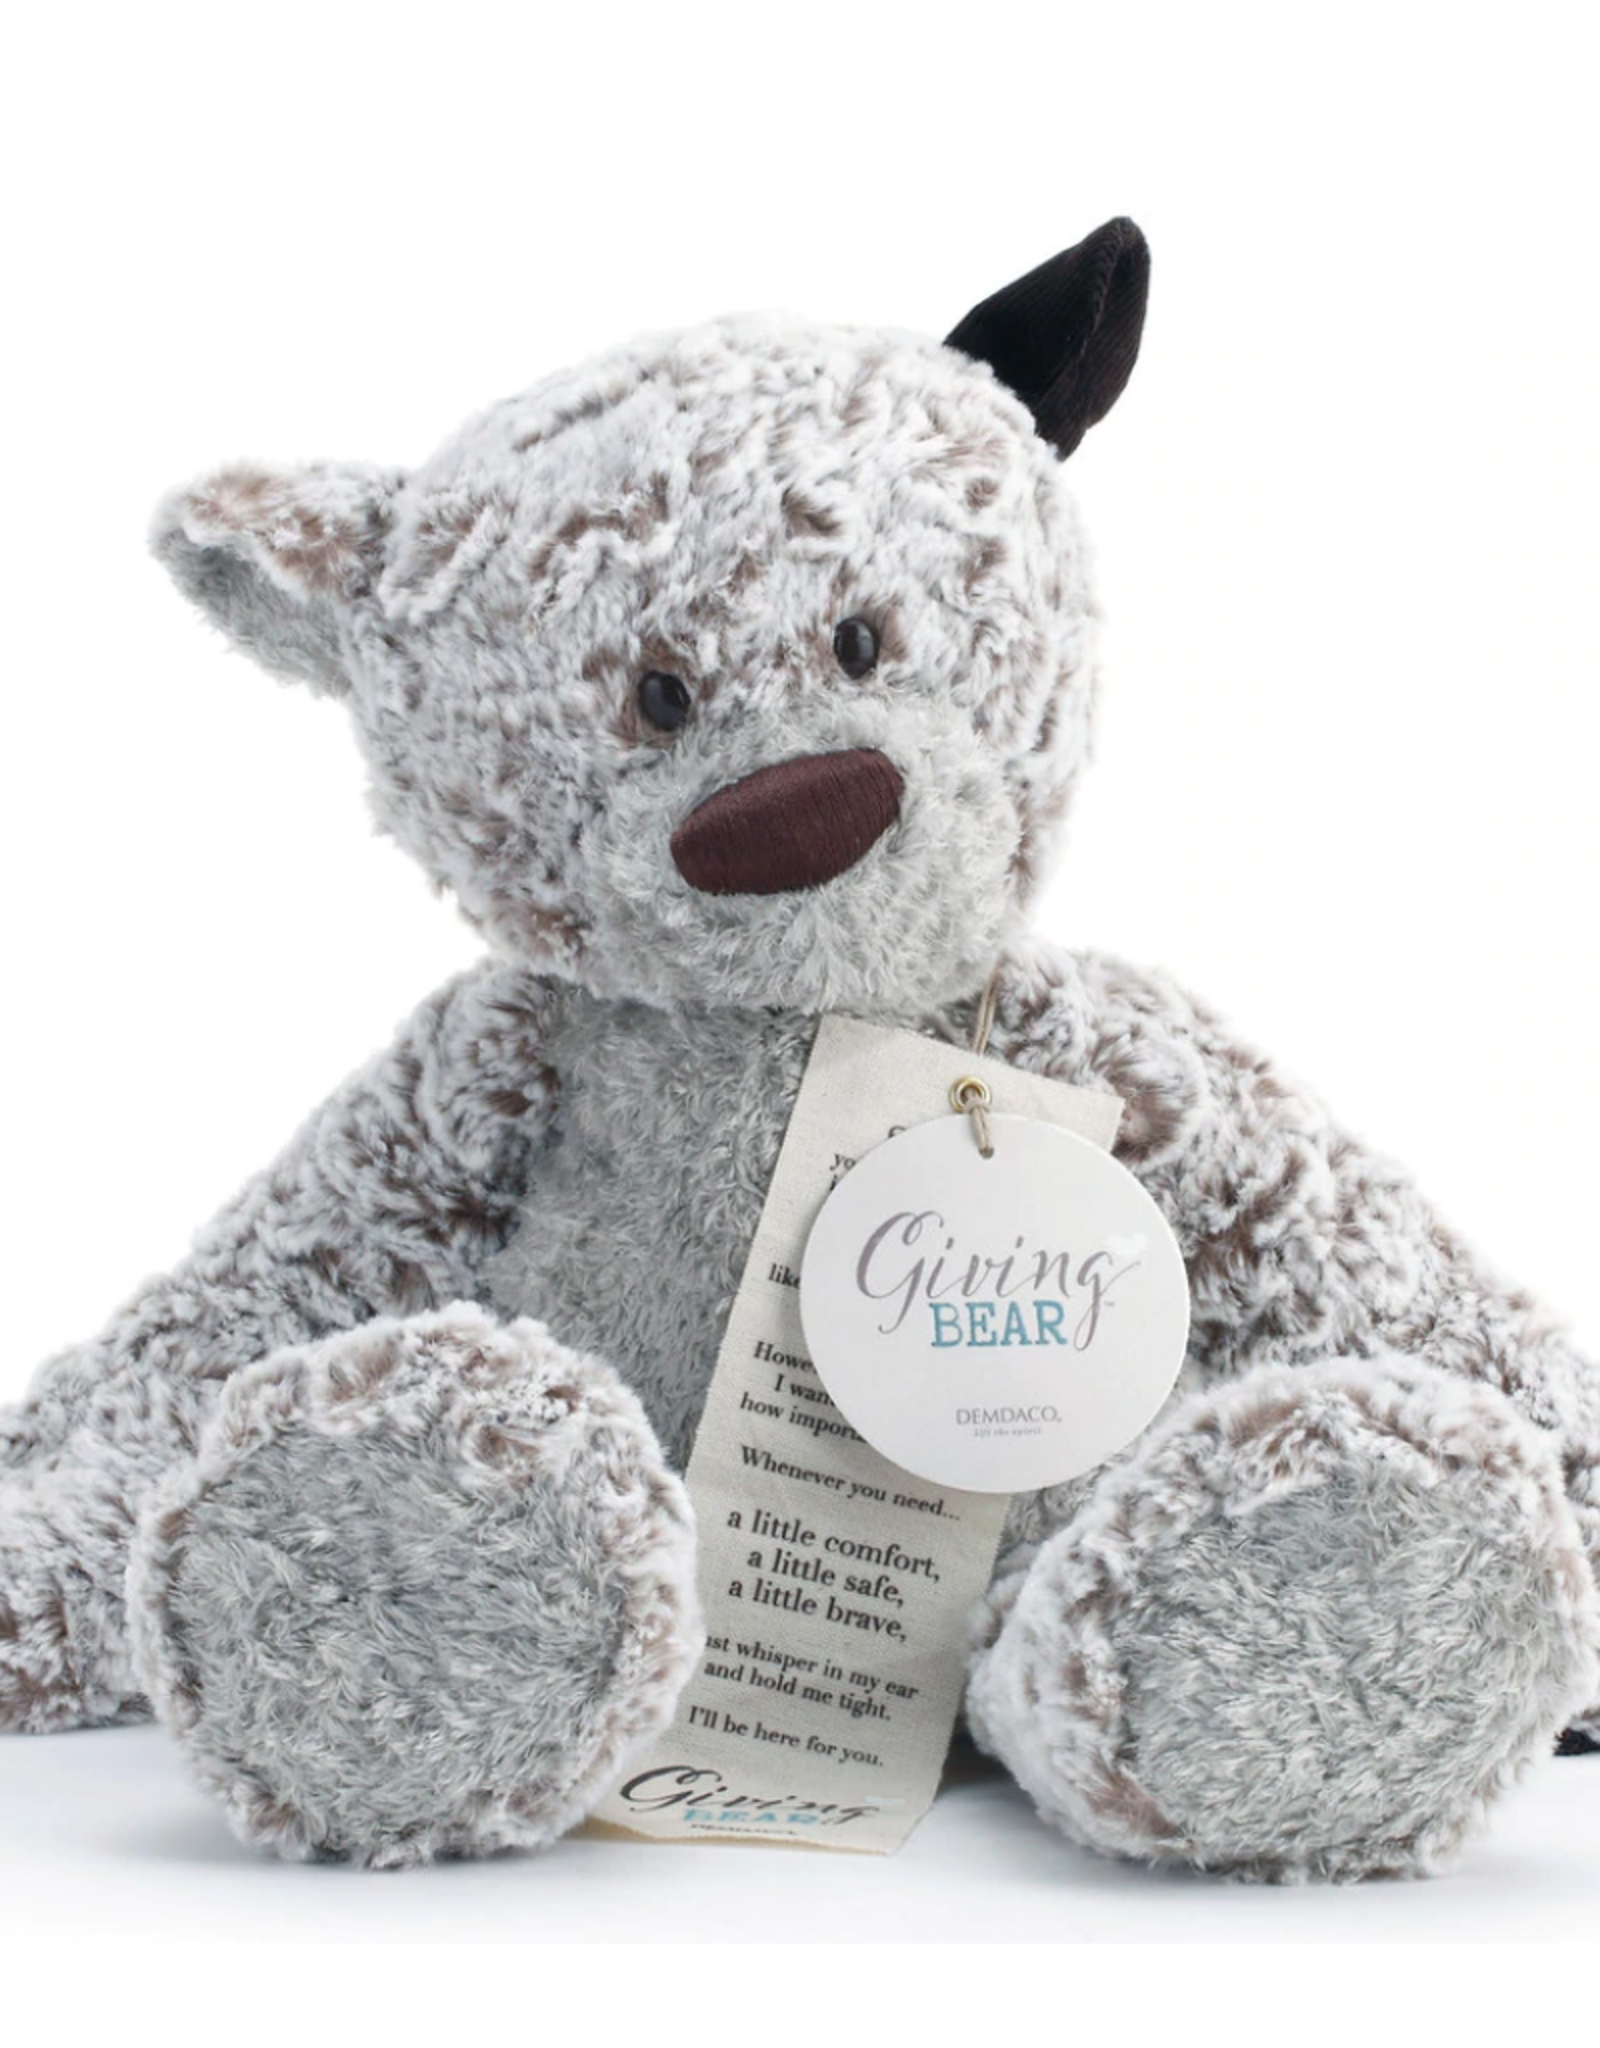 Demdaco - Giving Bear